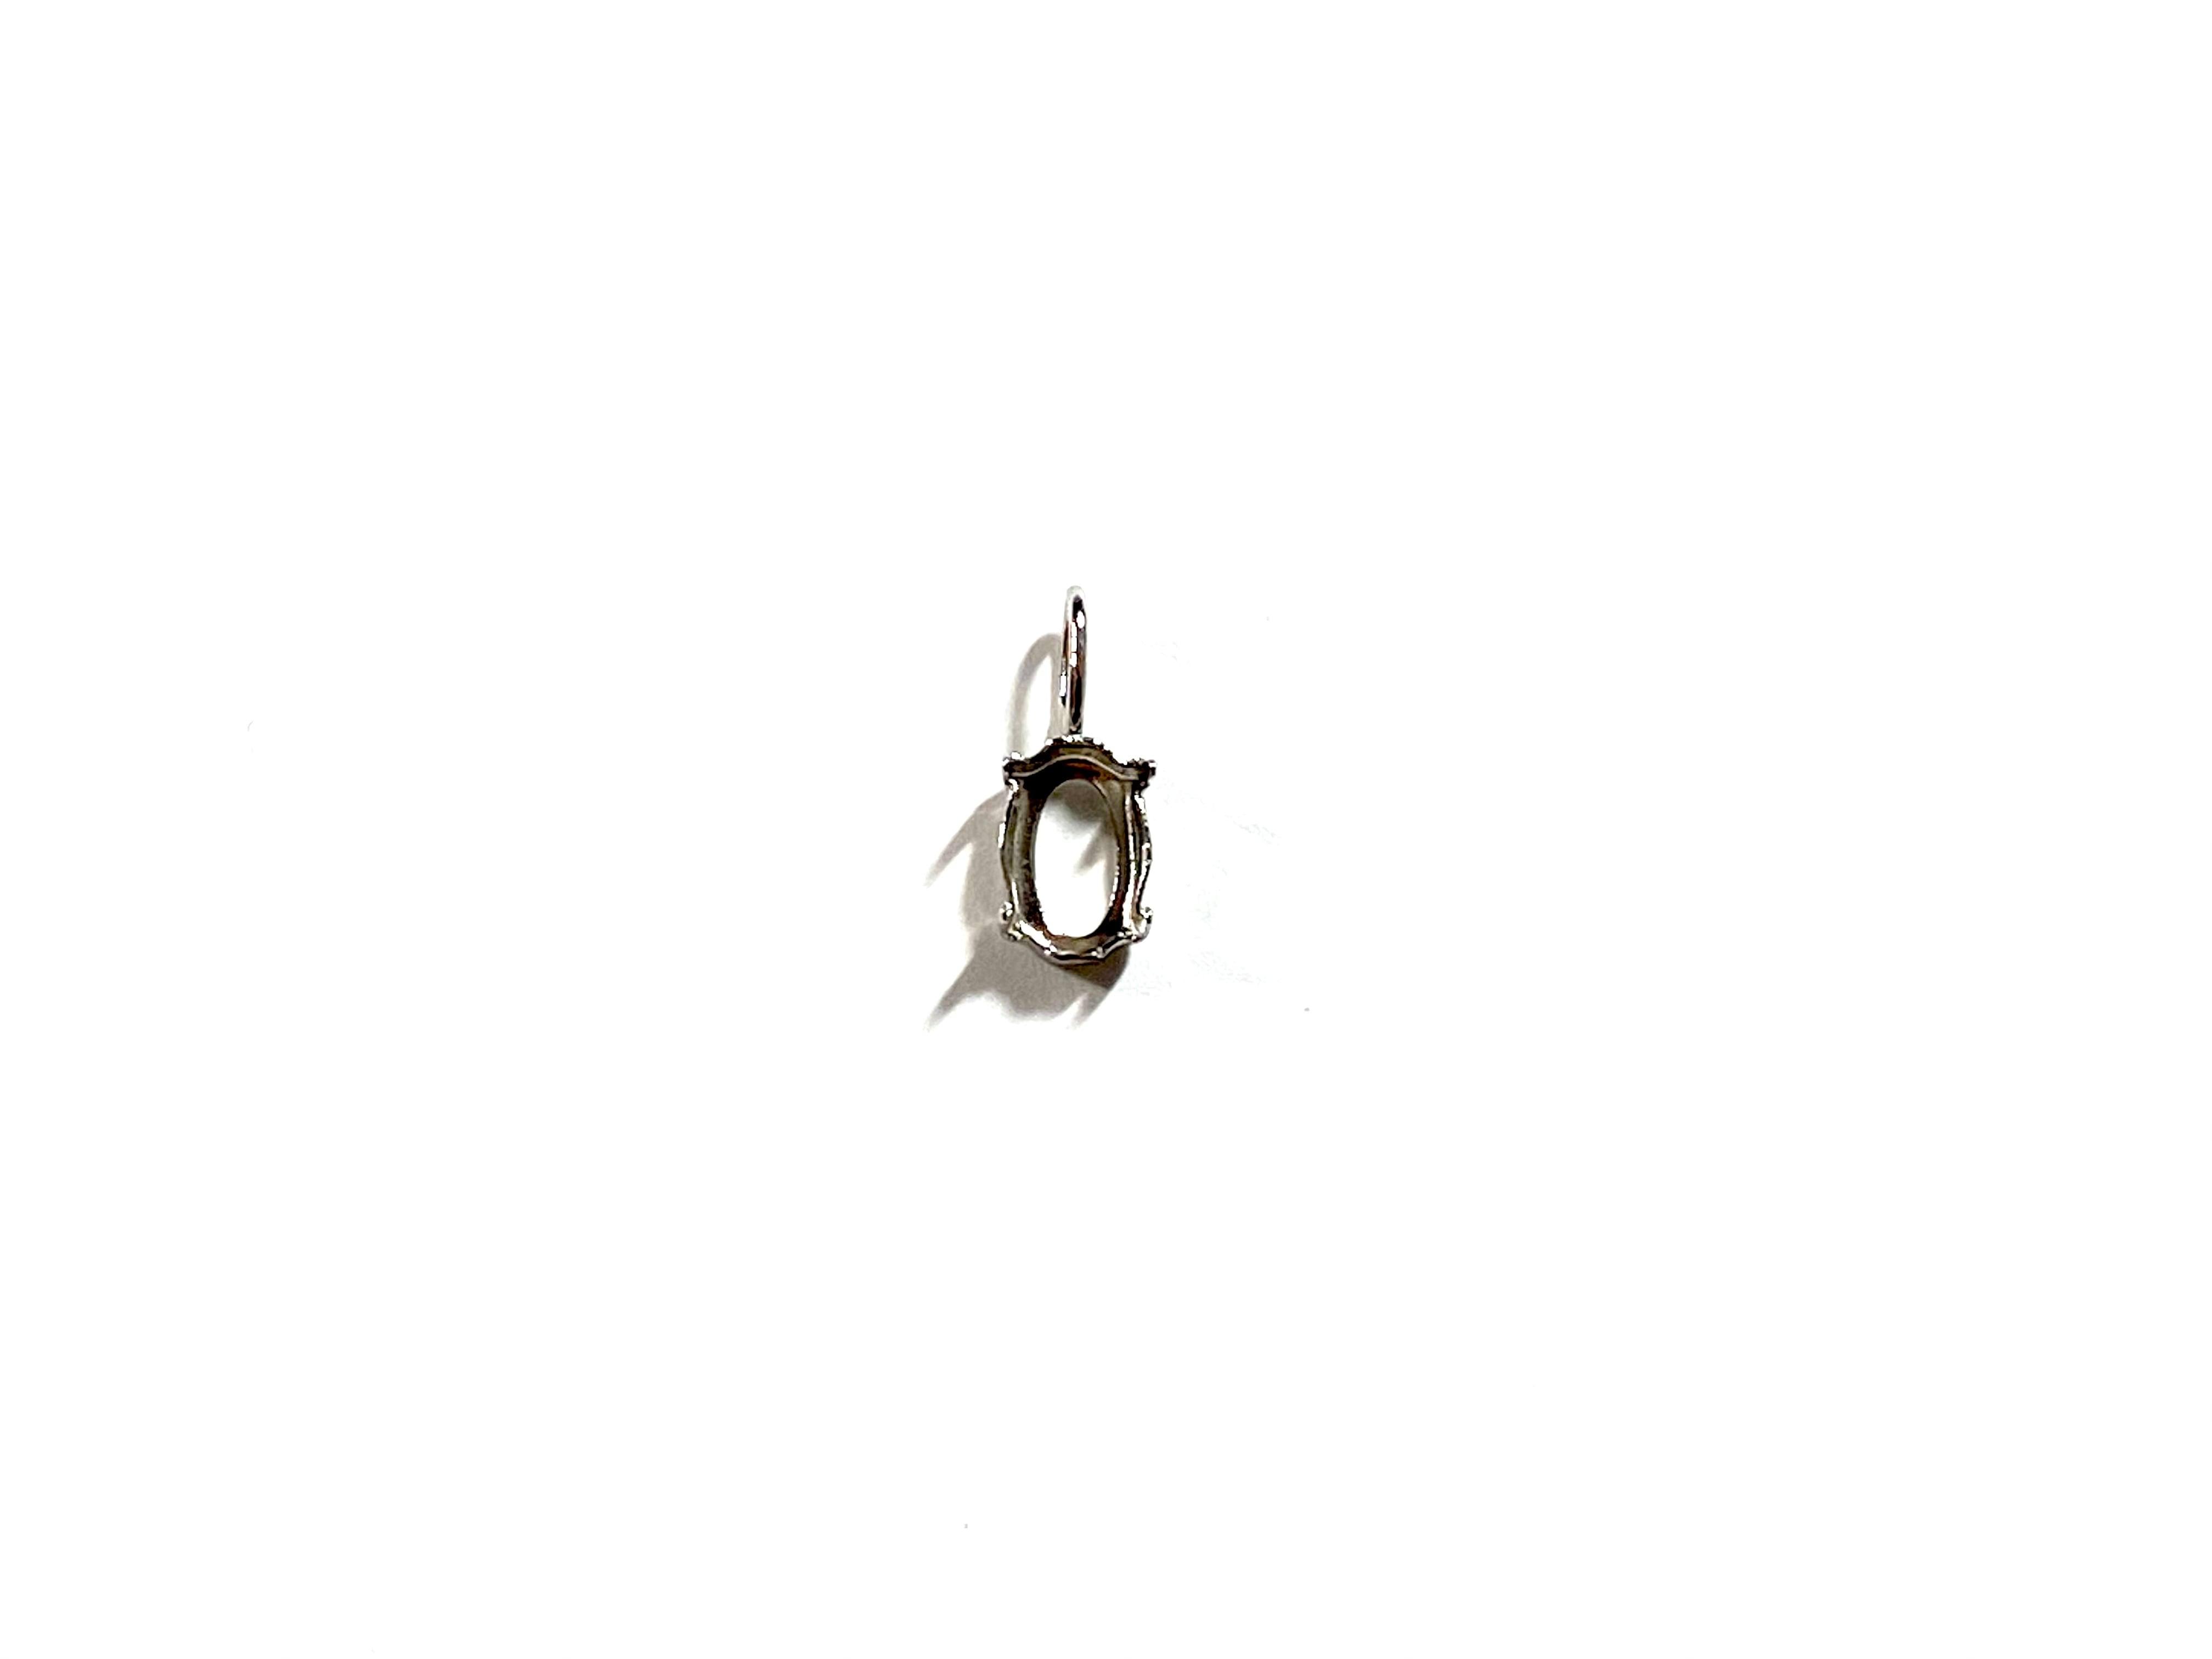 【K10WG】『タテ5mm ヨコ3mm』 オーバルカット対応空枠 [空枠No,1]